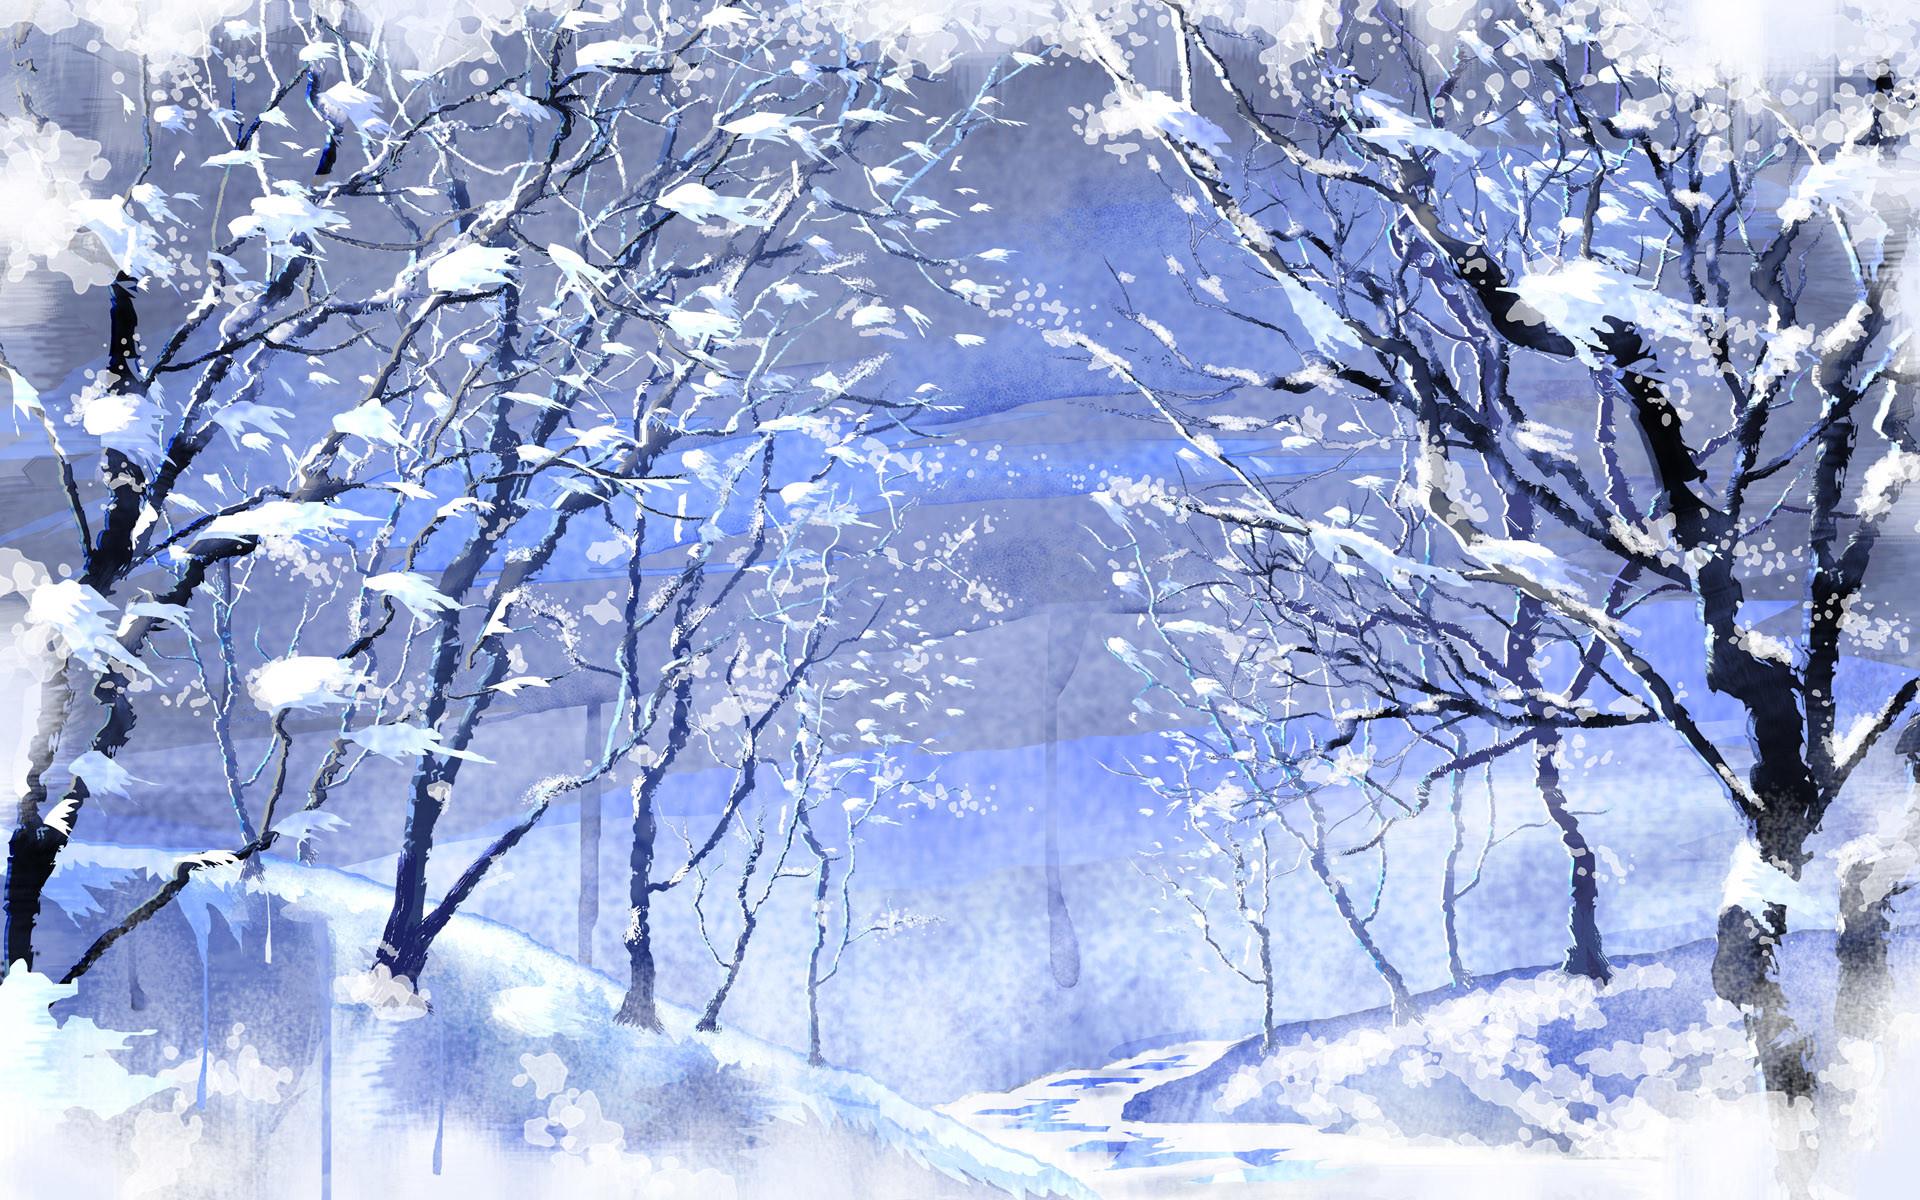 1920x1200 winter scene wallpaper free winter scene wallpaper christmas scenery download